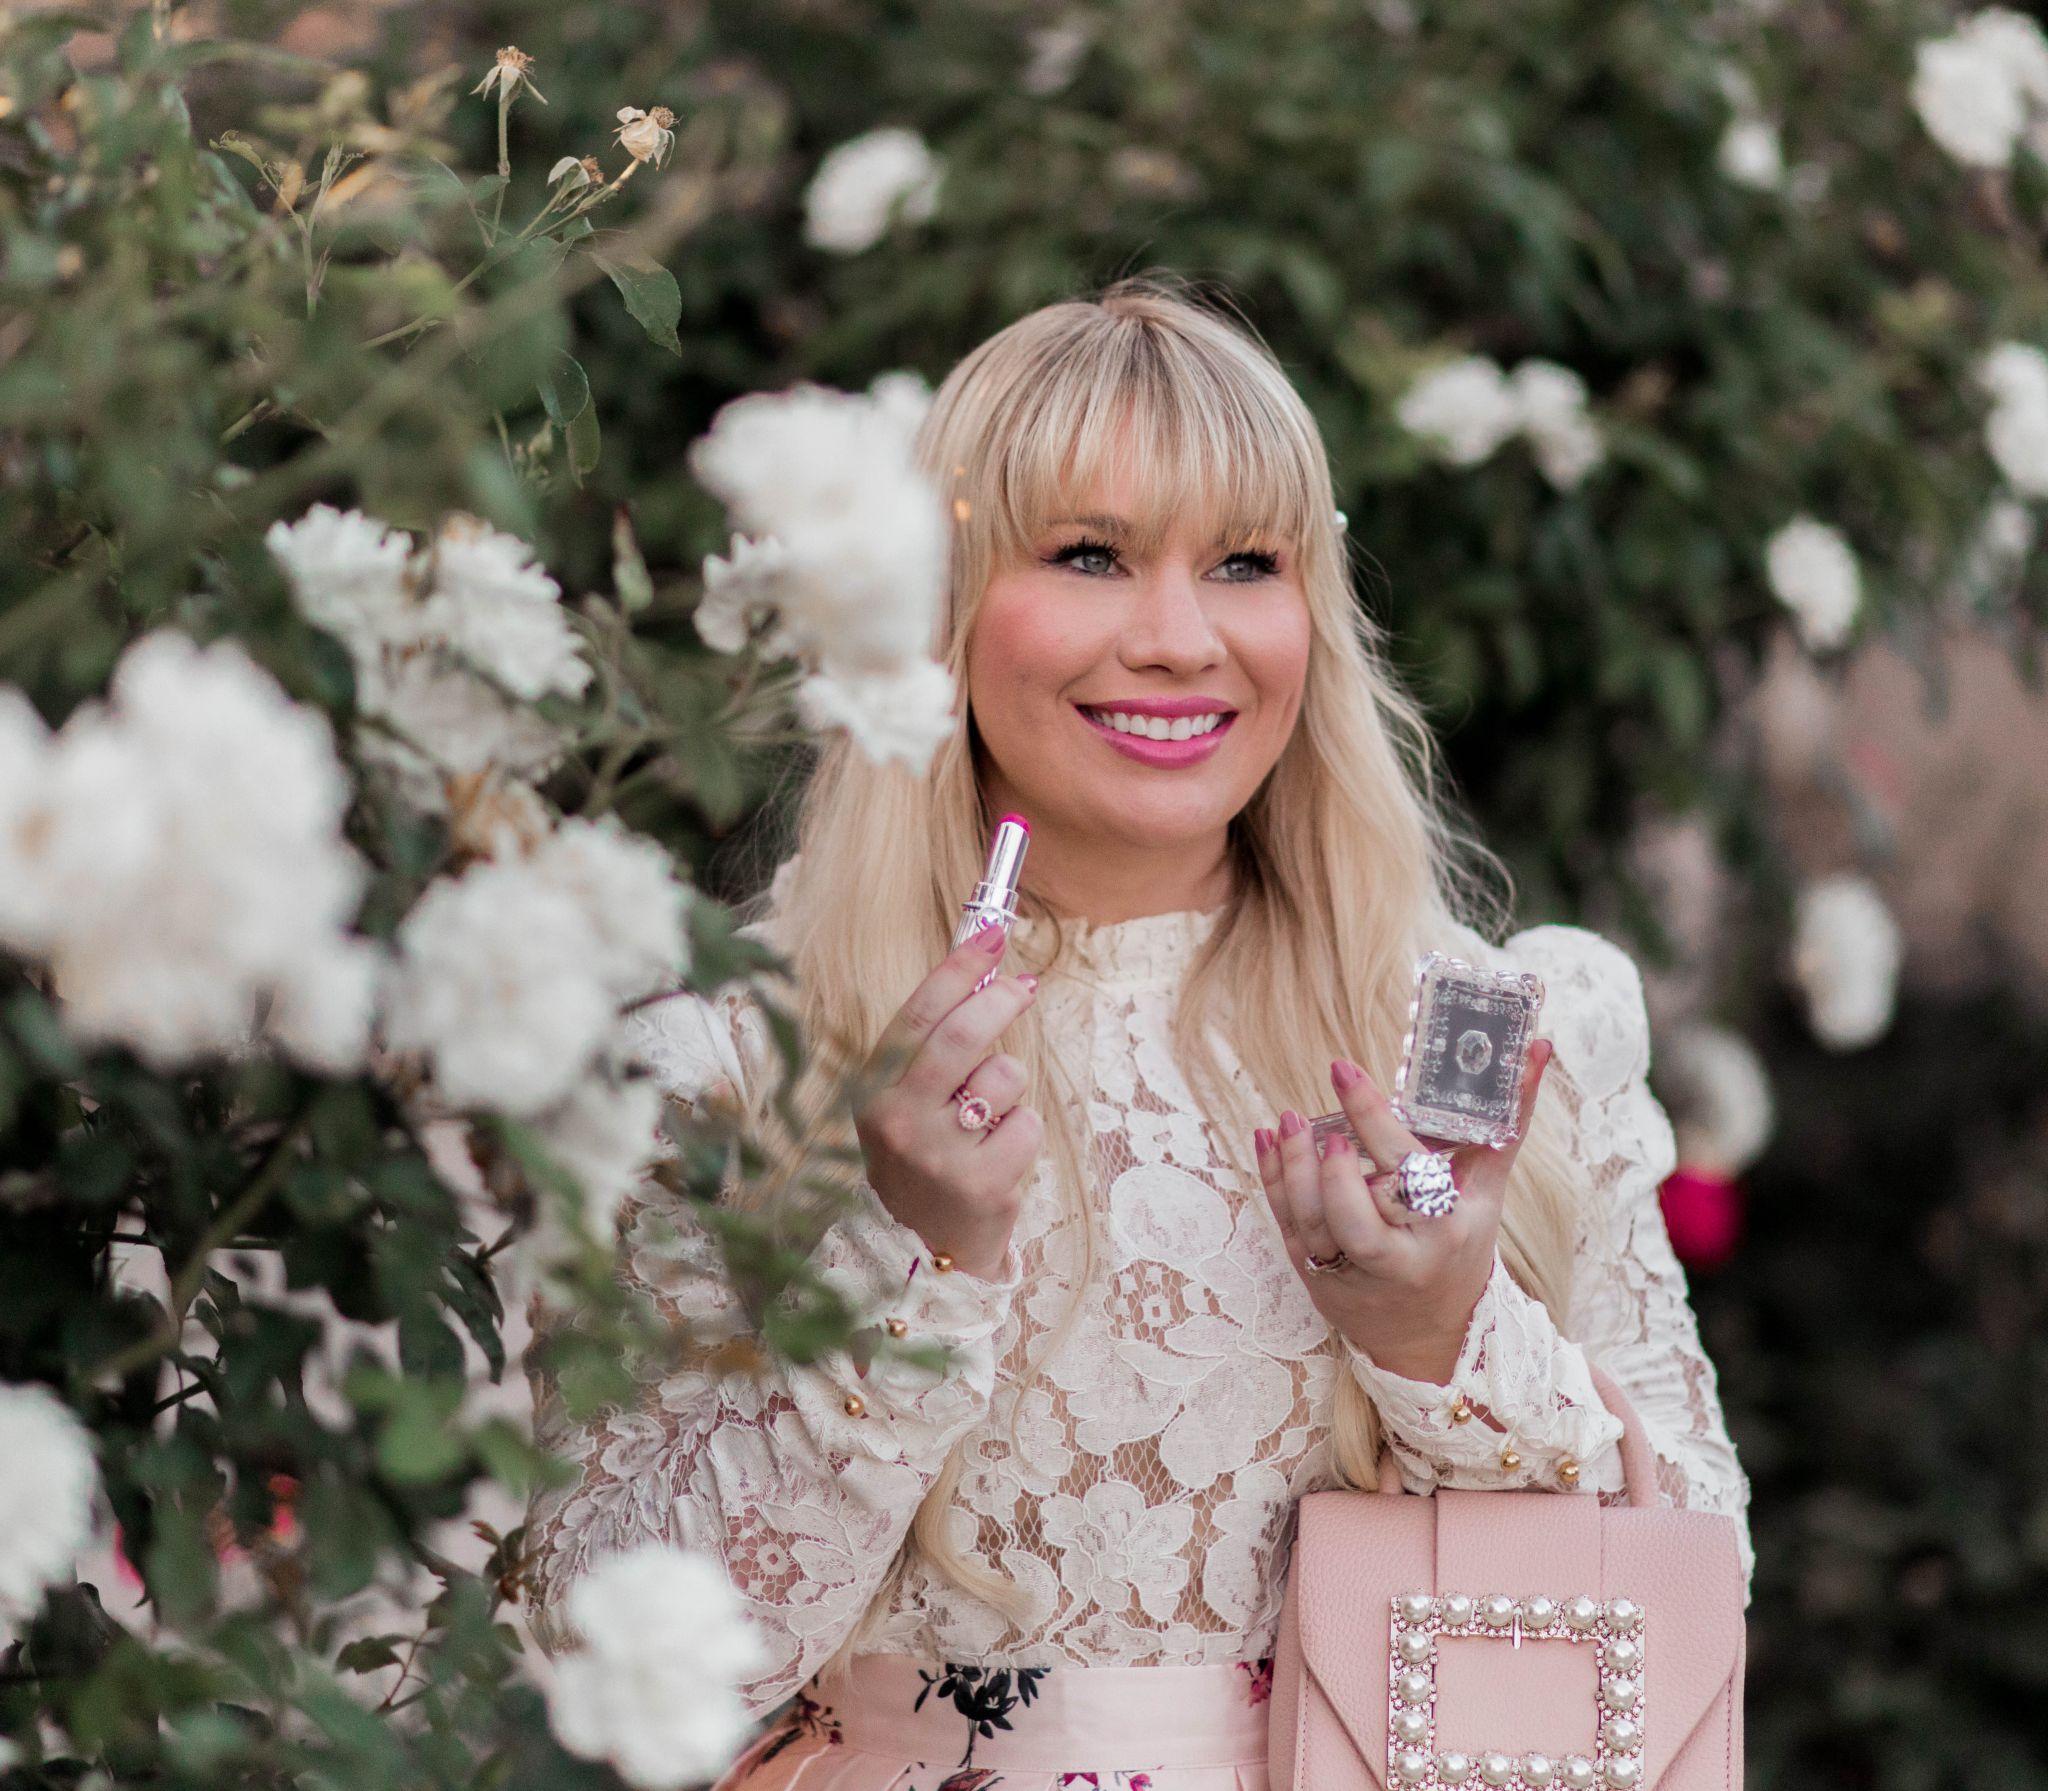 California fashion blogger, Elizabeth Hugen, wears pink Jill Stuart lipstick.